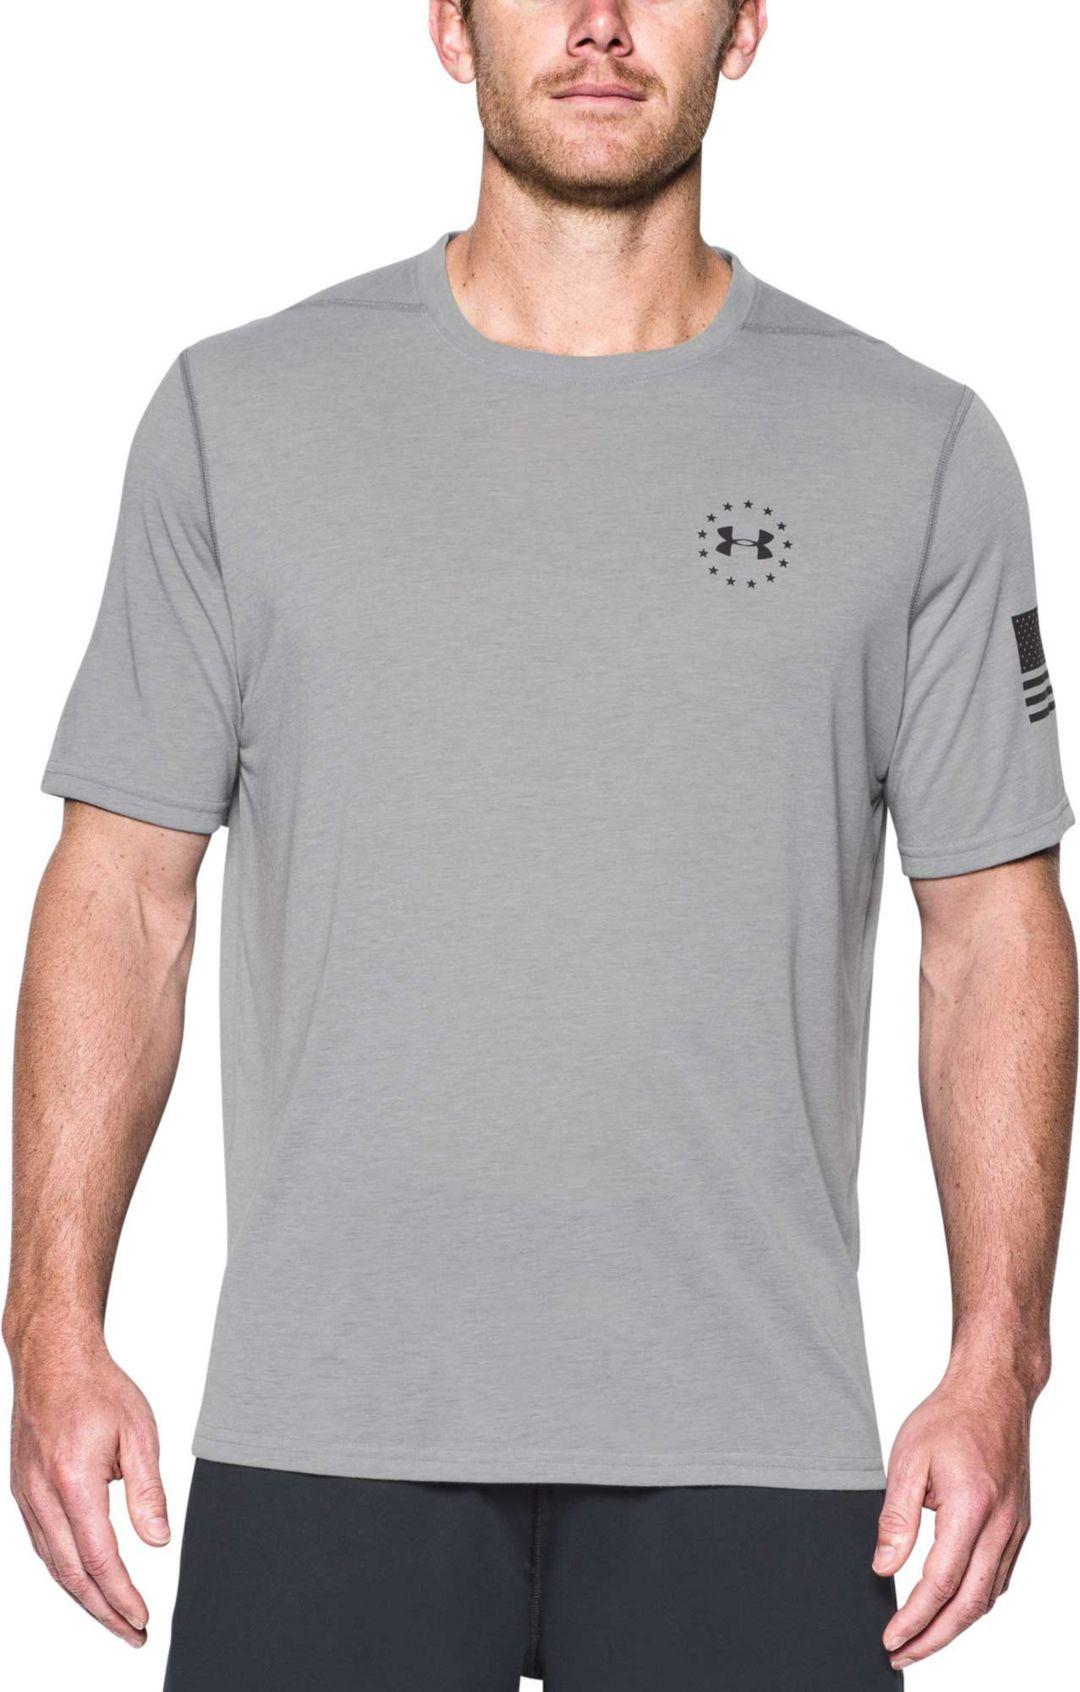 c277cdf7 Under Armour Men's Freedom Siro T-Shirt | Field & Stream